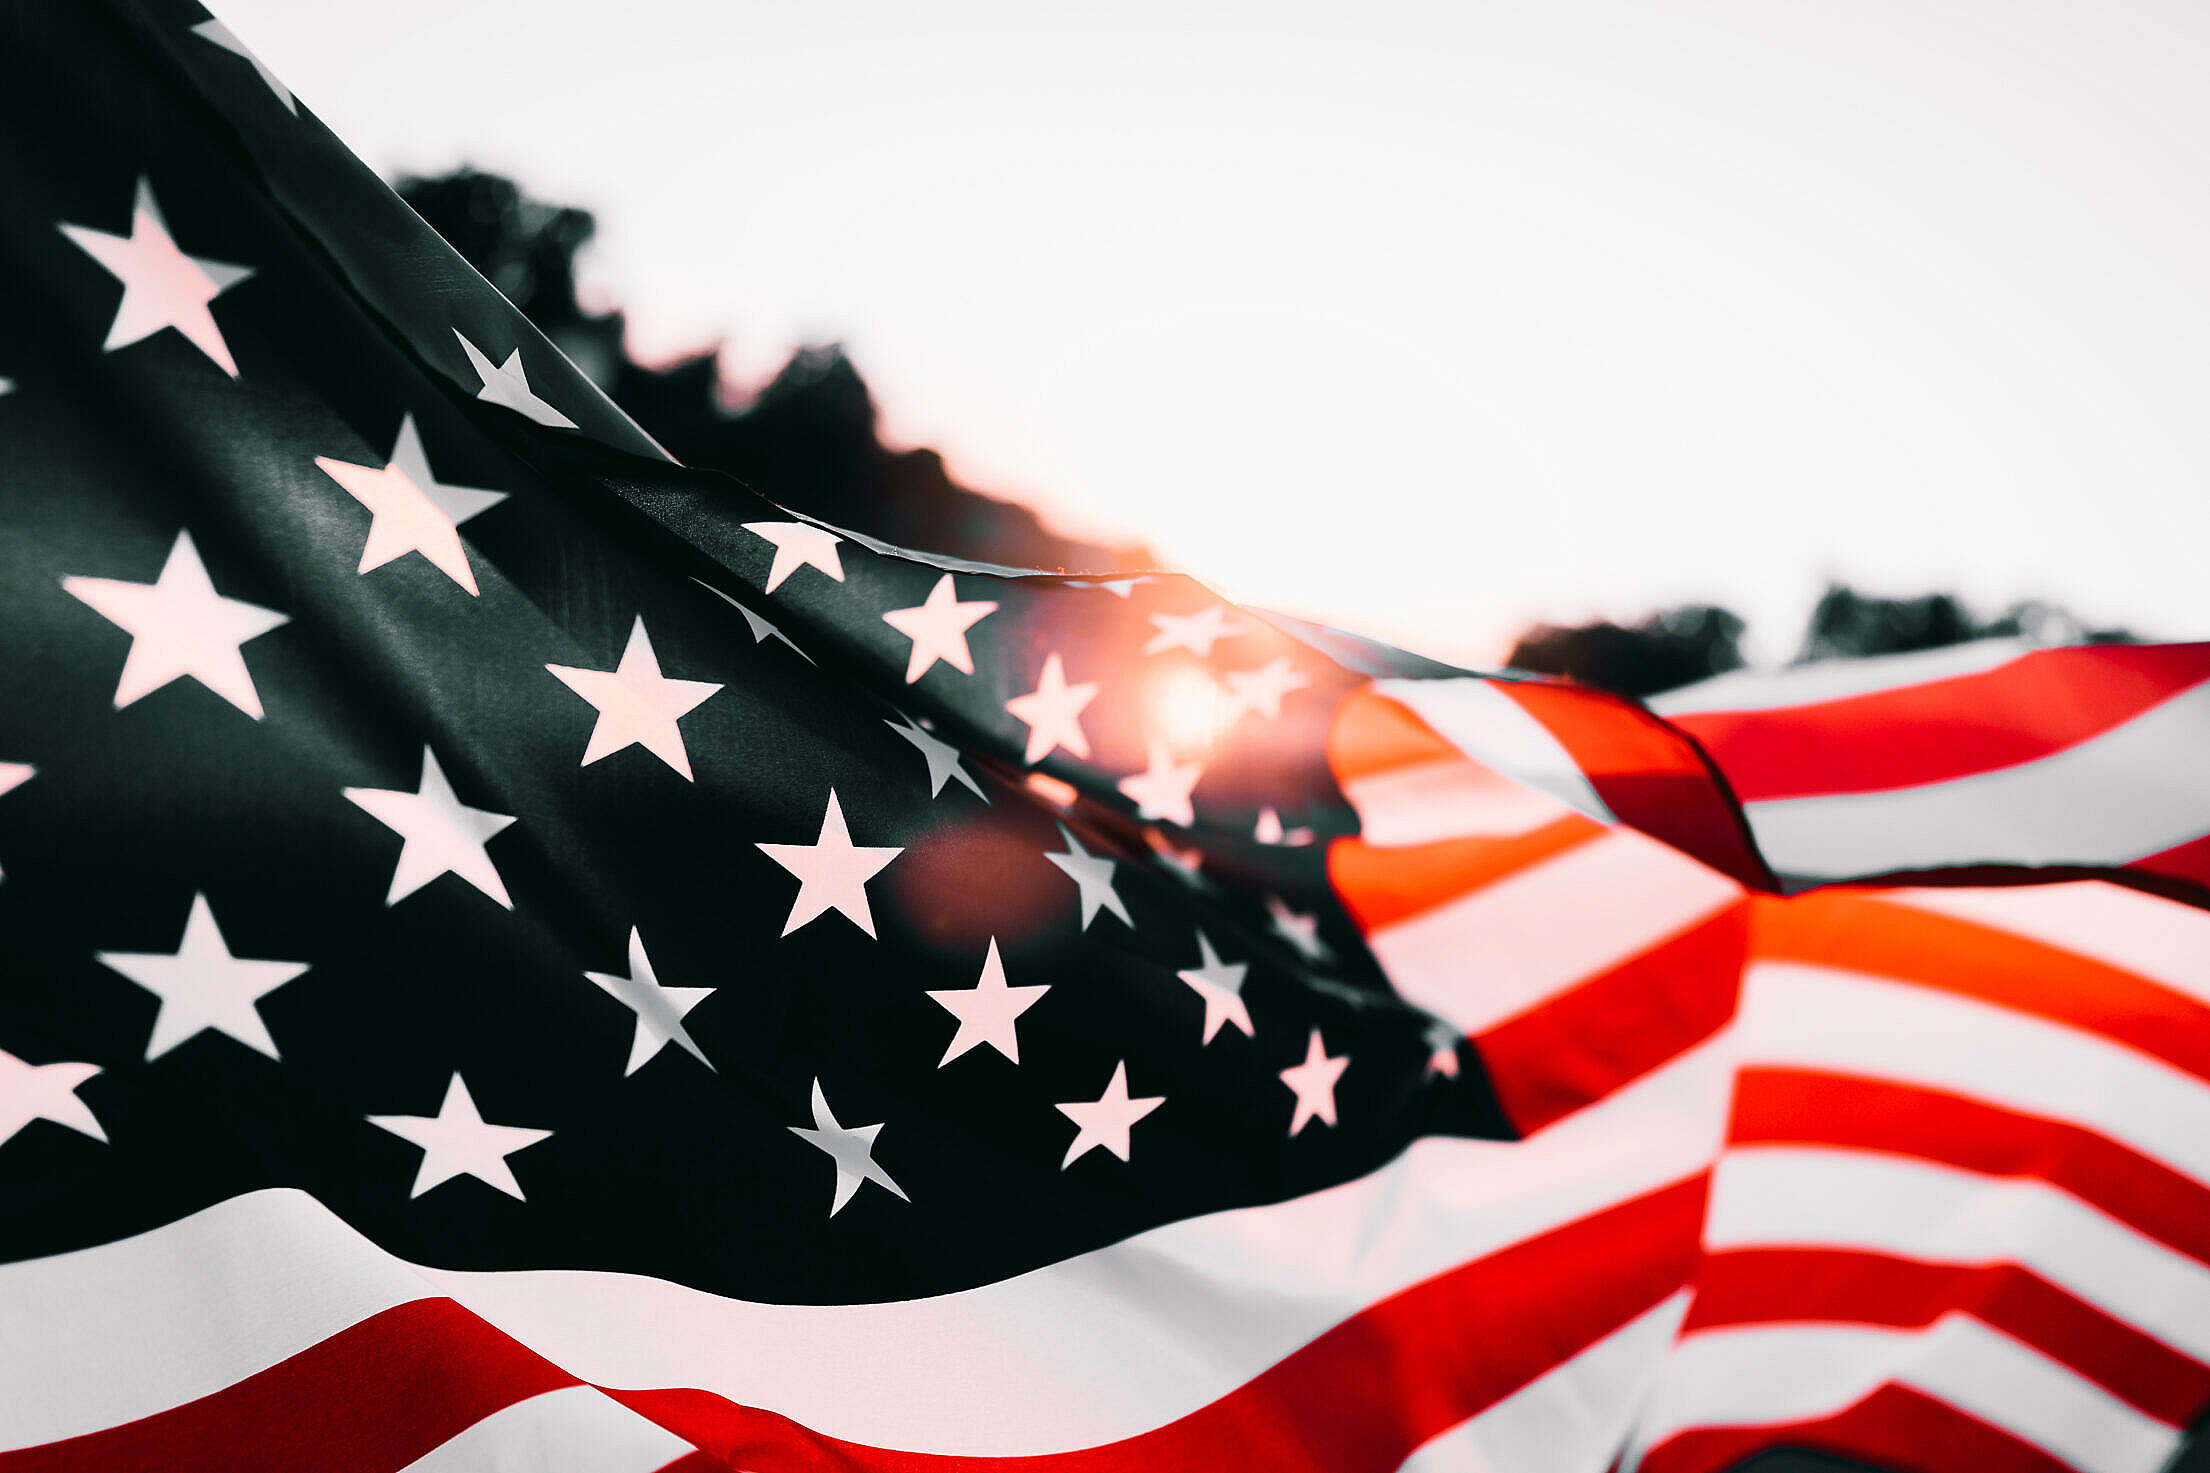 Waving American Flag at Sunset Free Stock Photo